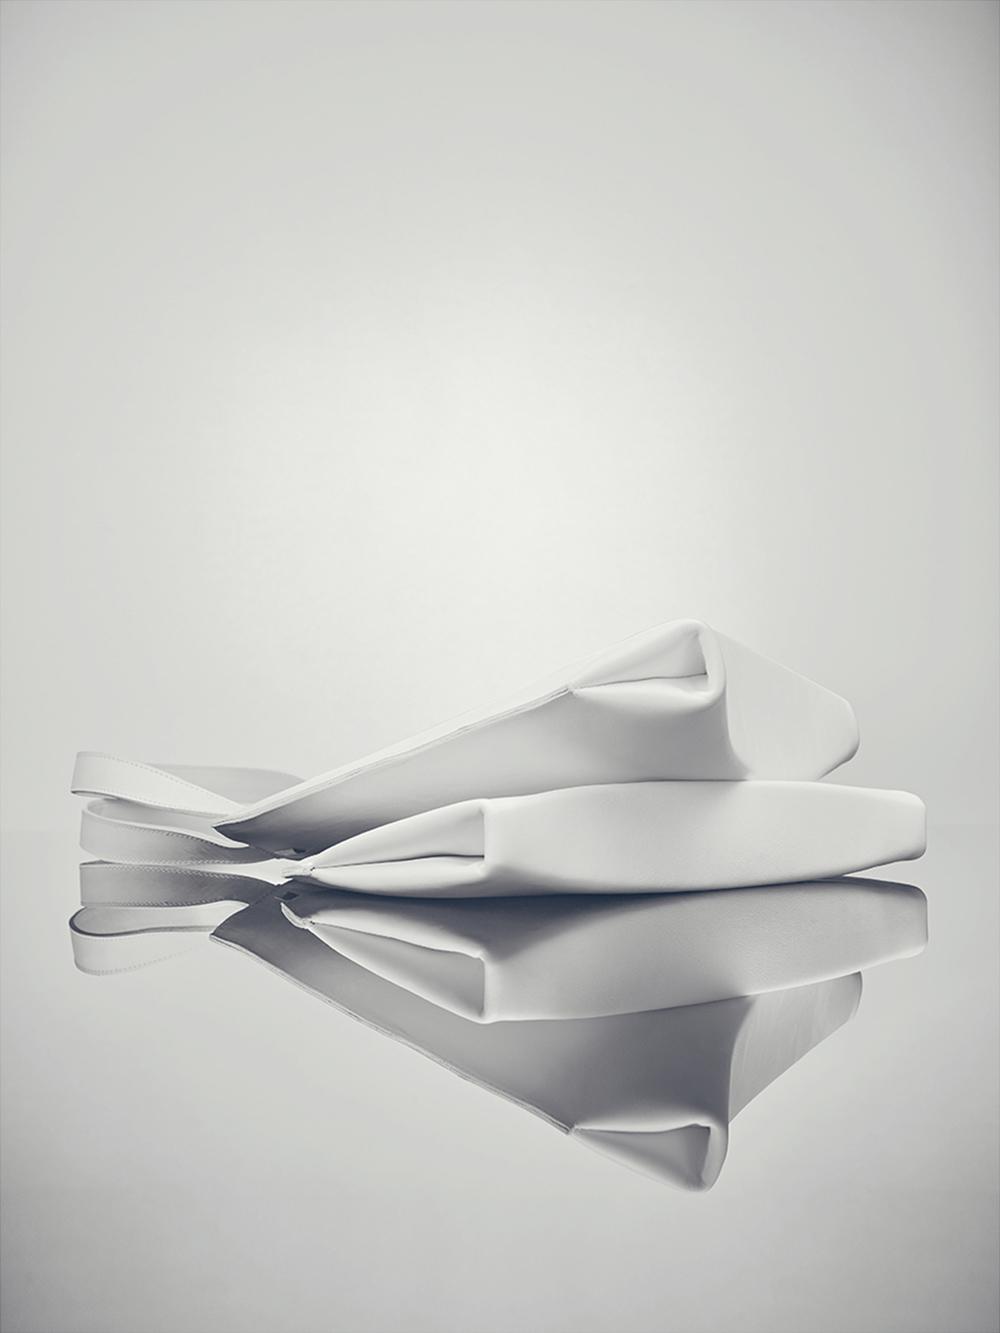 Invert-by-Agnes-Kovacs-02.jpg